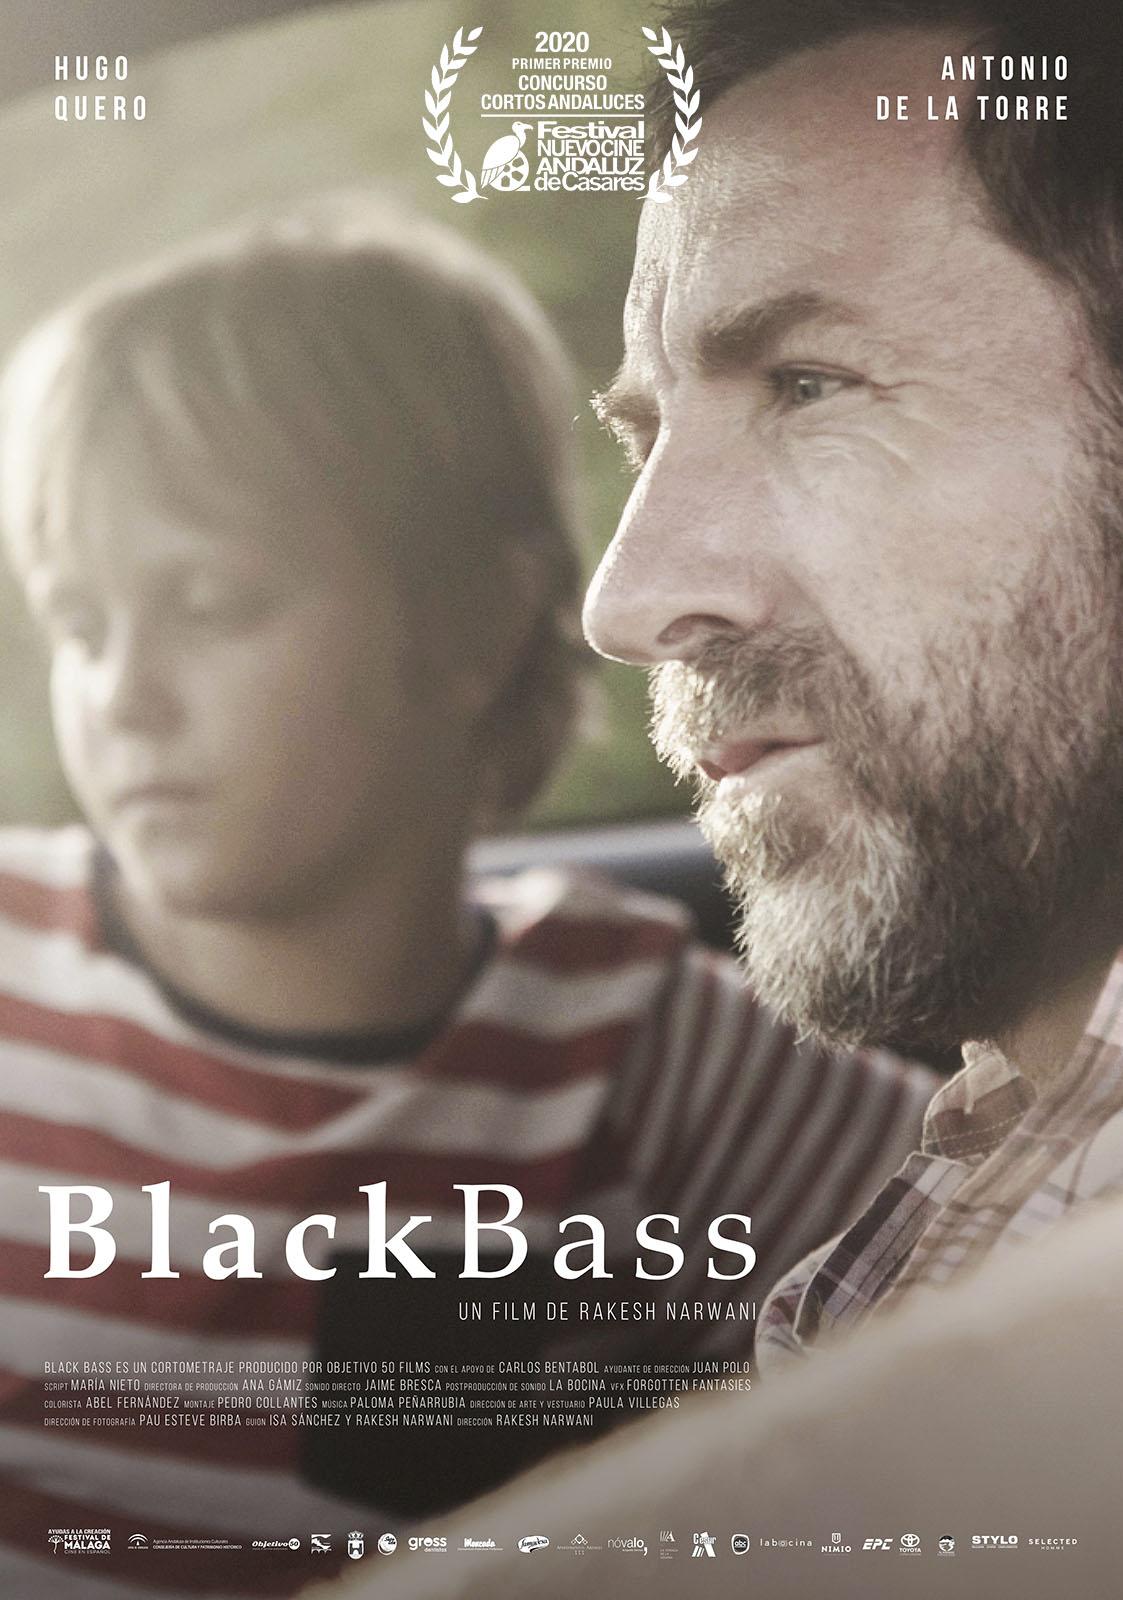 Black Bass, de Rakesh B. Narwani, Primer premio Concurso Cortos Andaluces Nuevo Cine Andaluz 2020